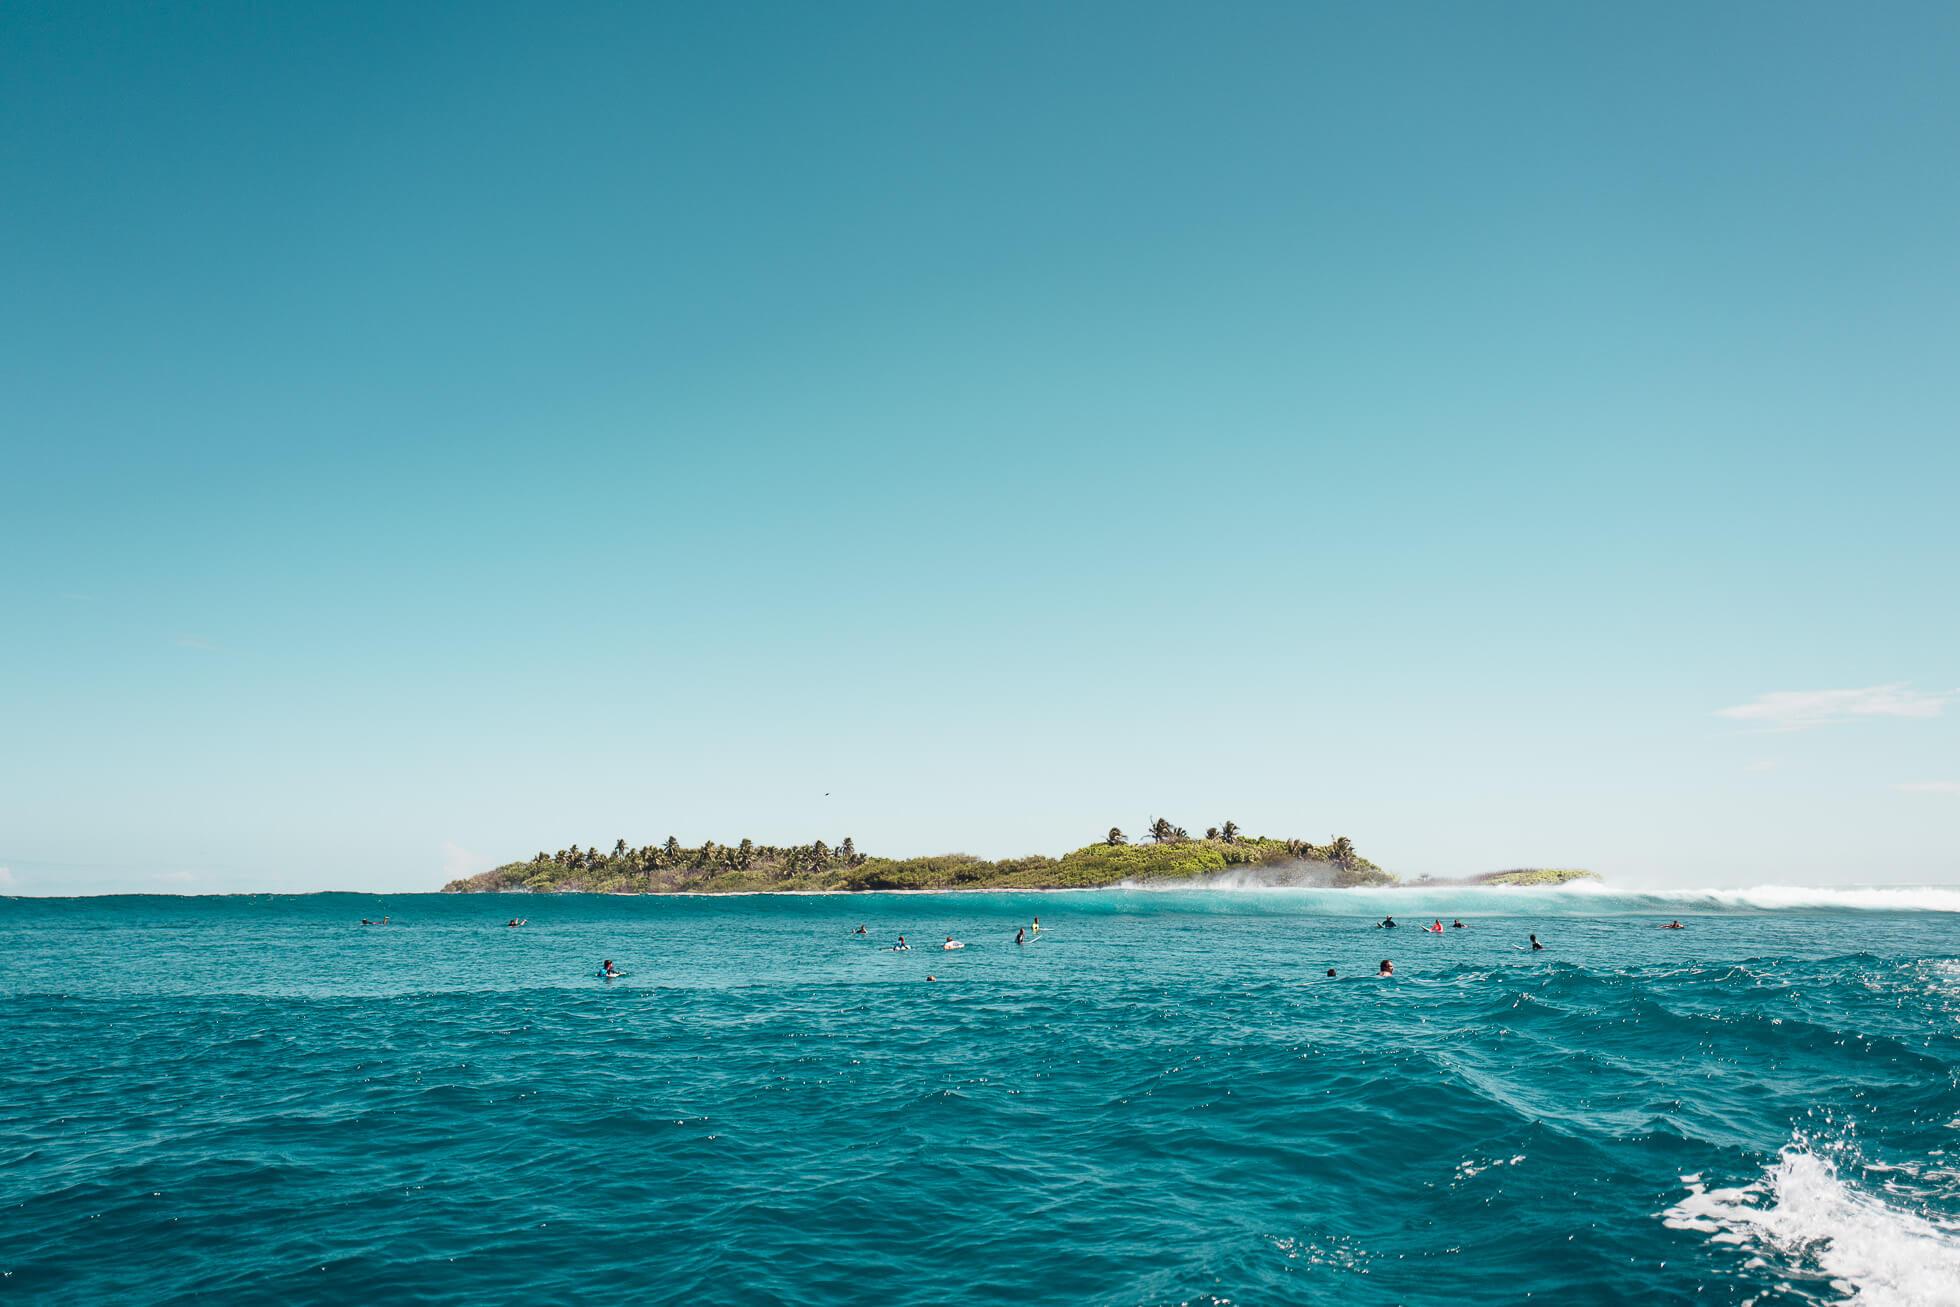 janni-deler-maldives-momentsl1120350